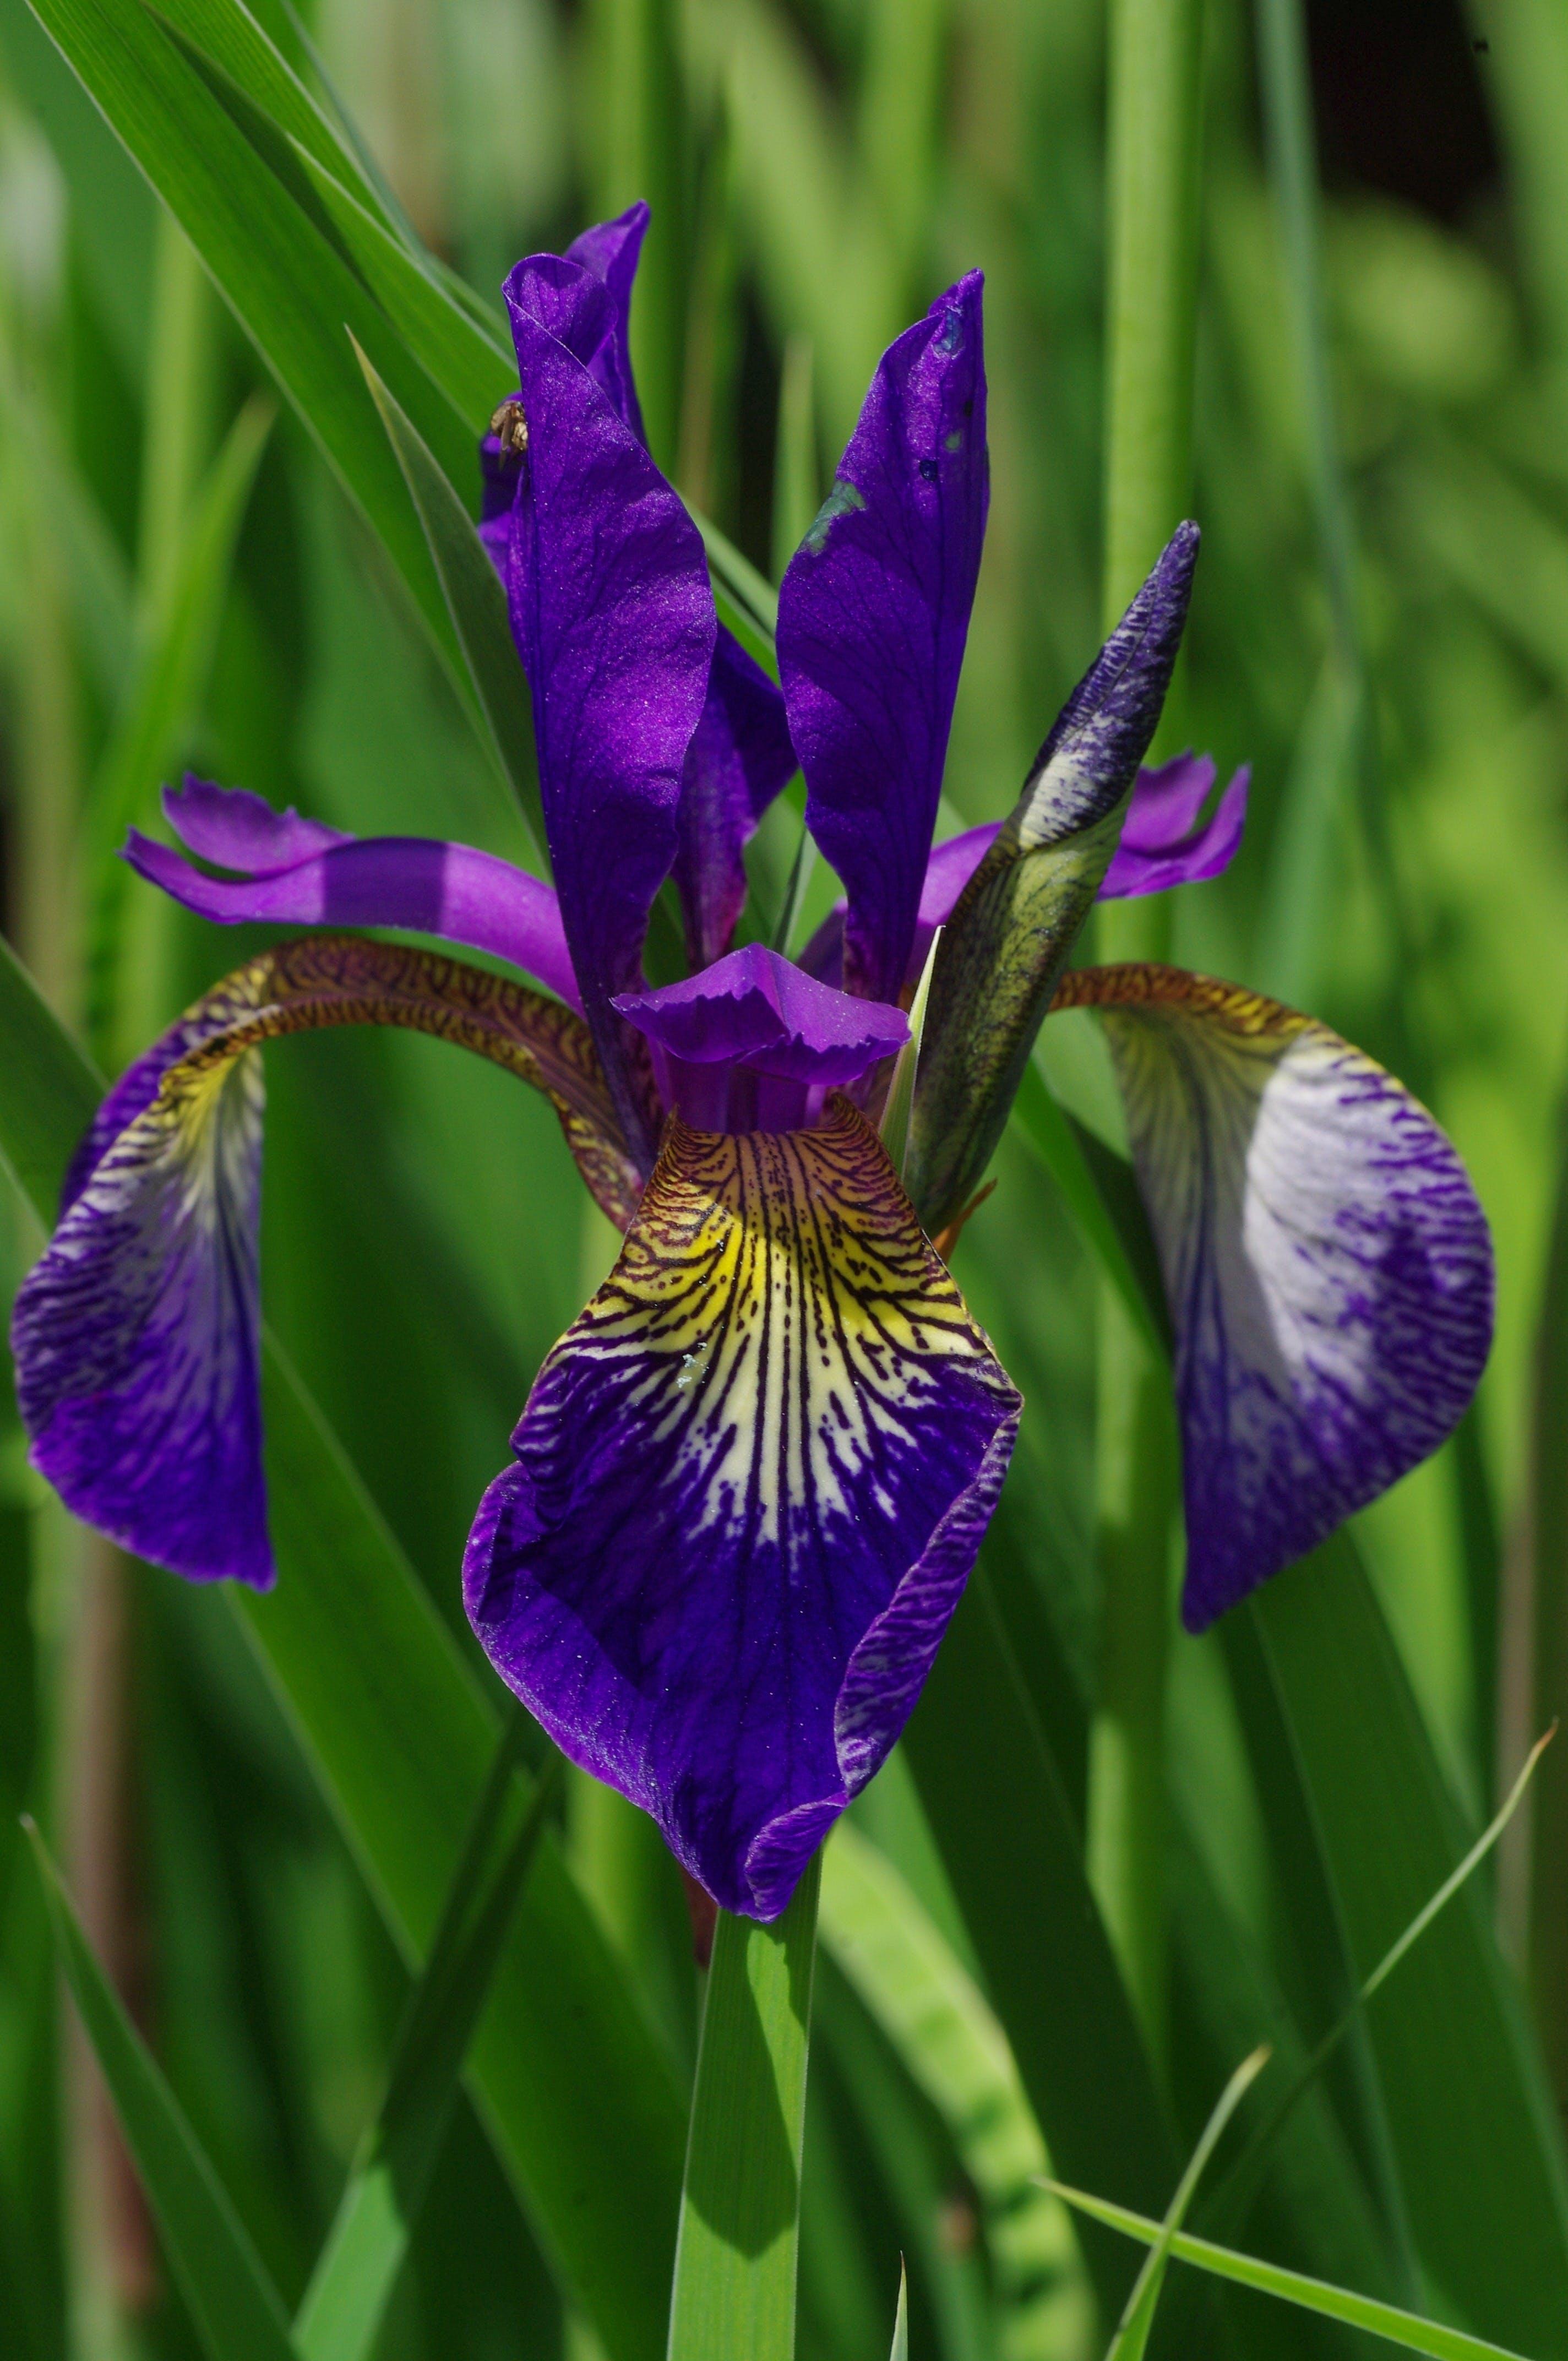 Close Up Photo of Purple Broad Petal Flower